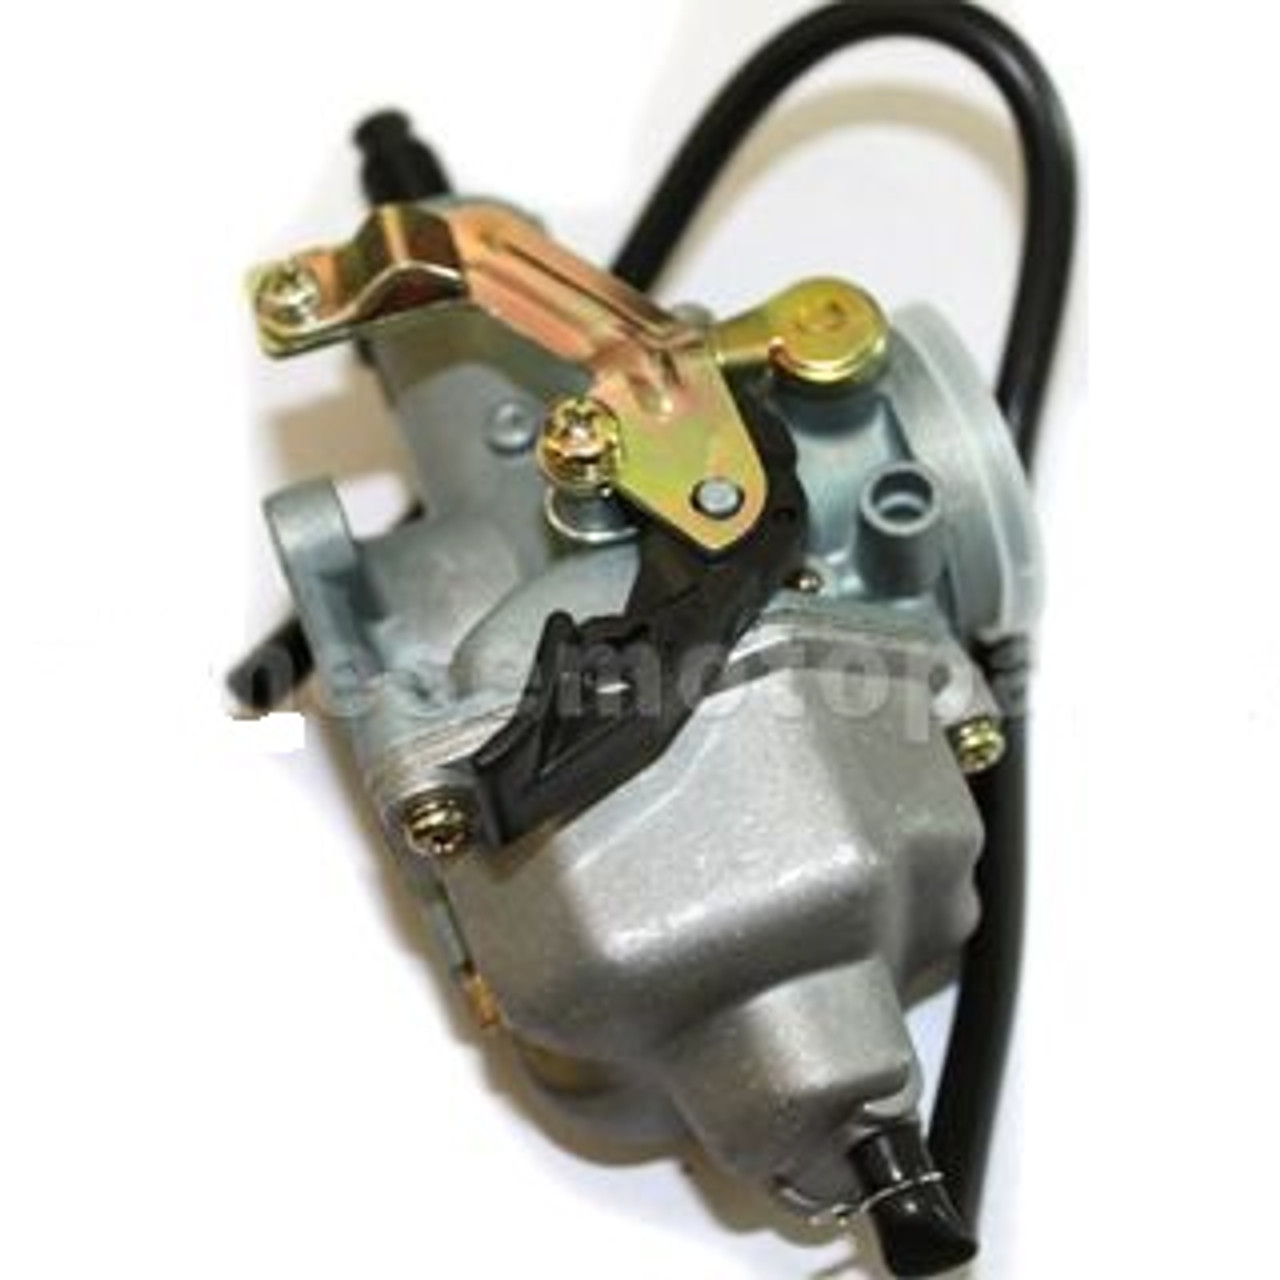 Rhino 250 150G Adjustable Keihin Carburetor Carb PZ26 26mm